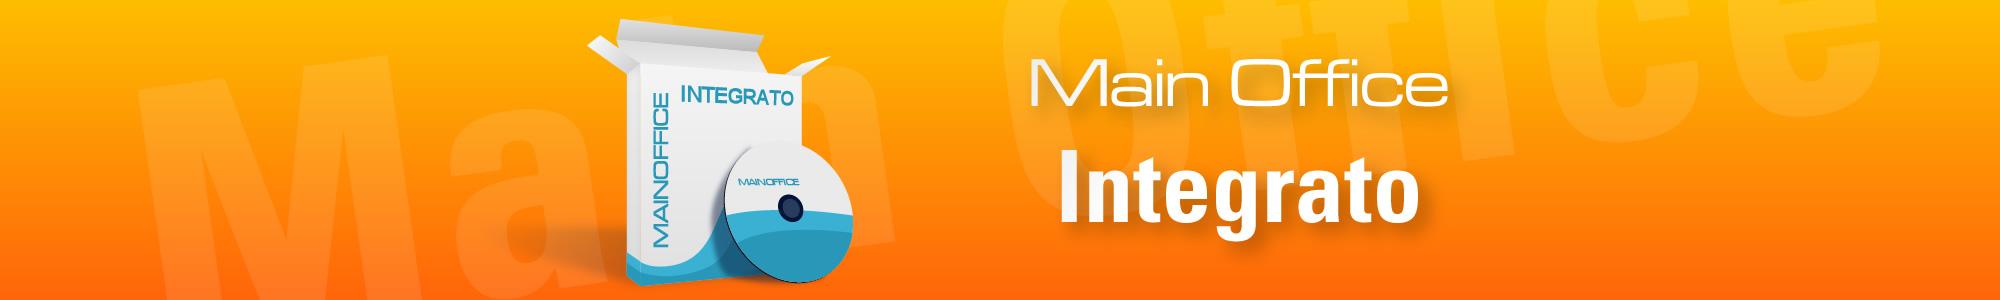 img_integrato